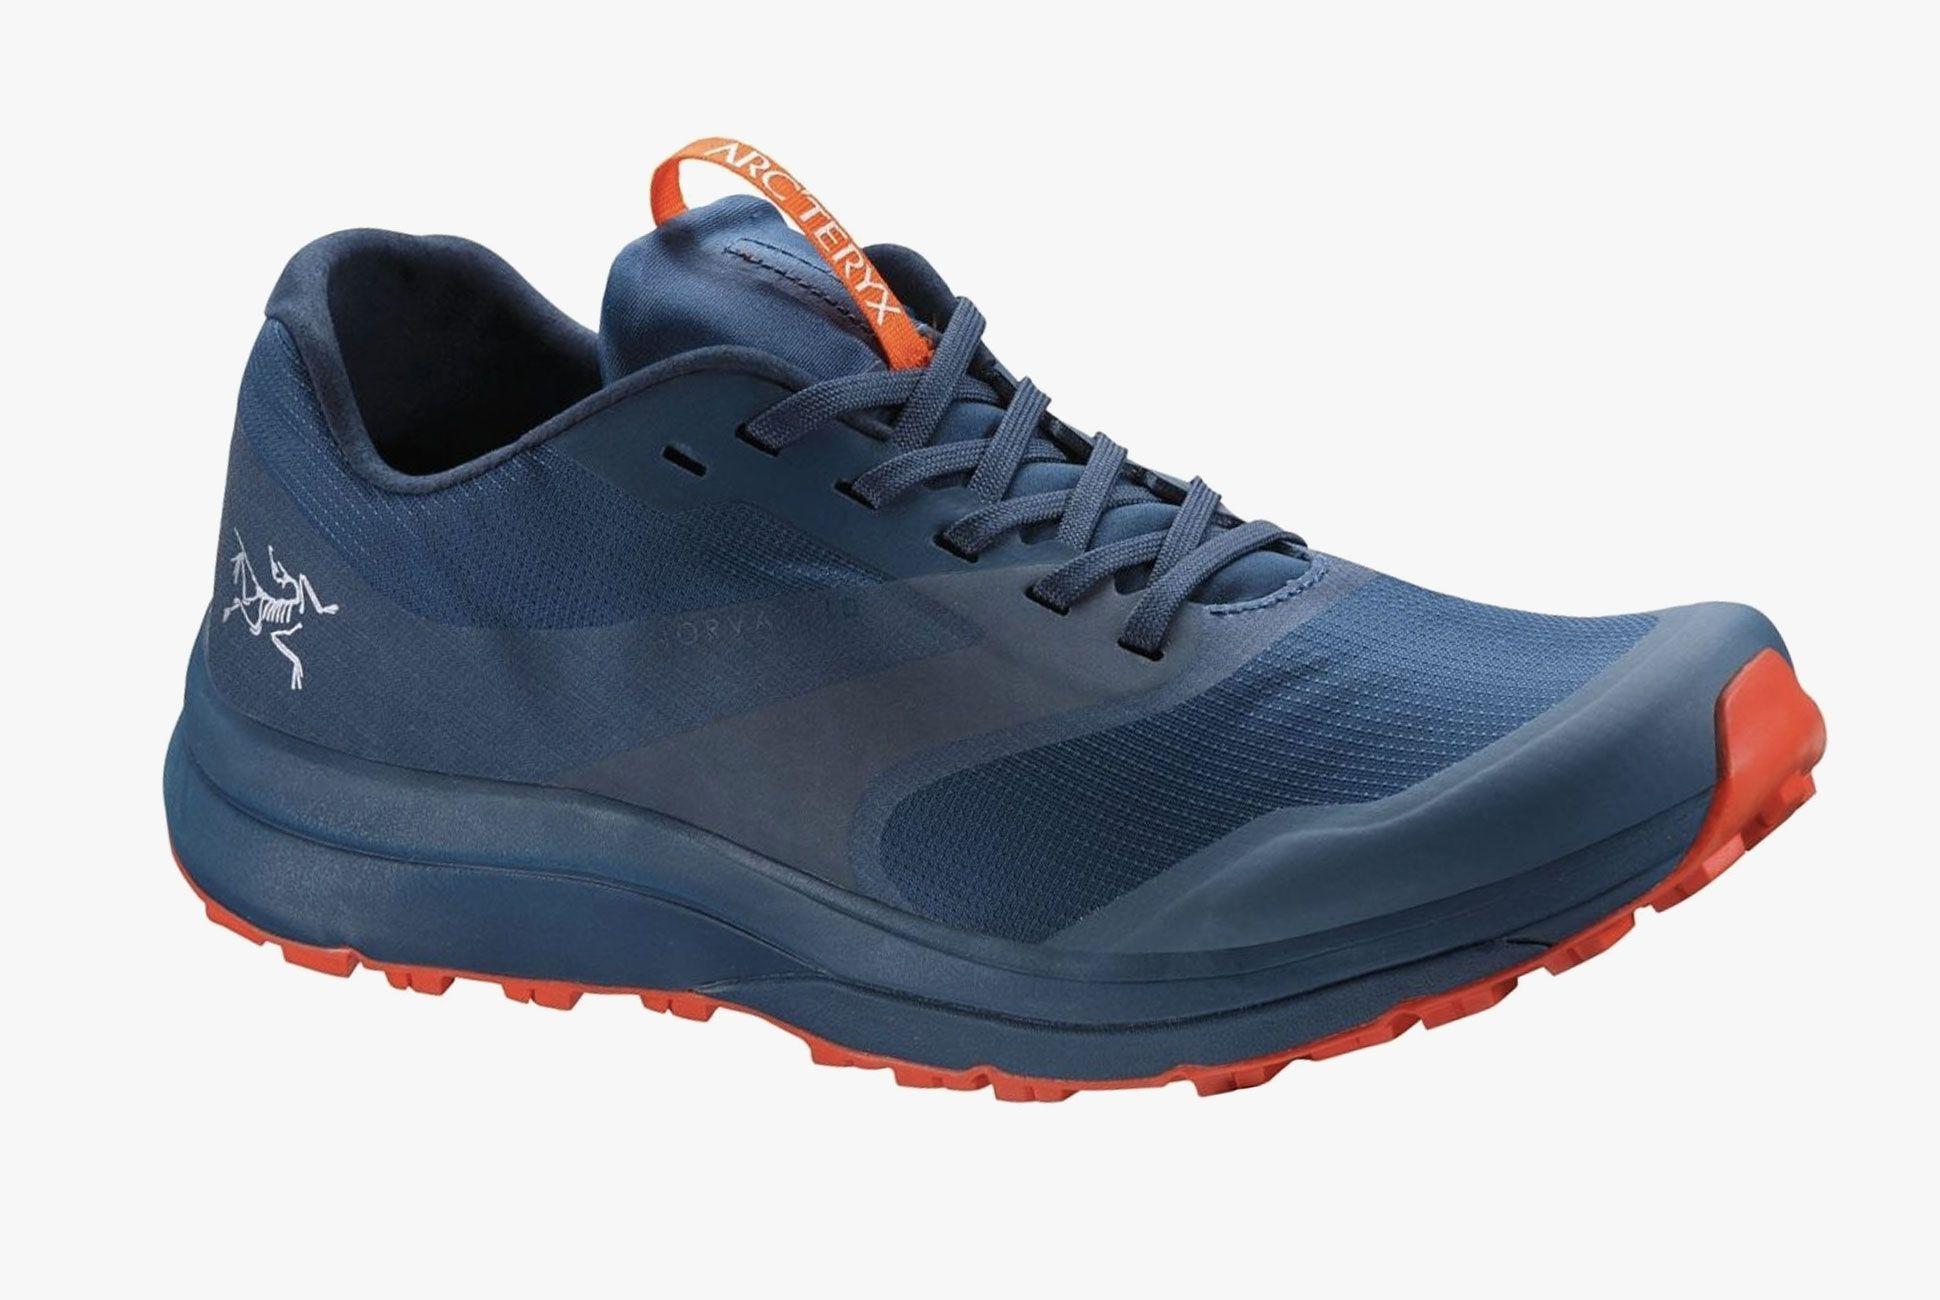 mens mizuno running shoes size 9.5 in usa cheap uae